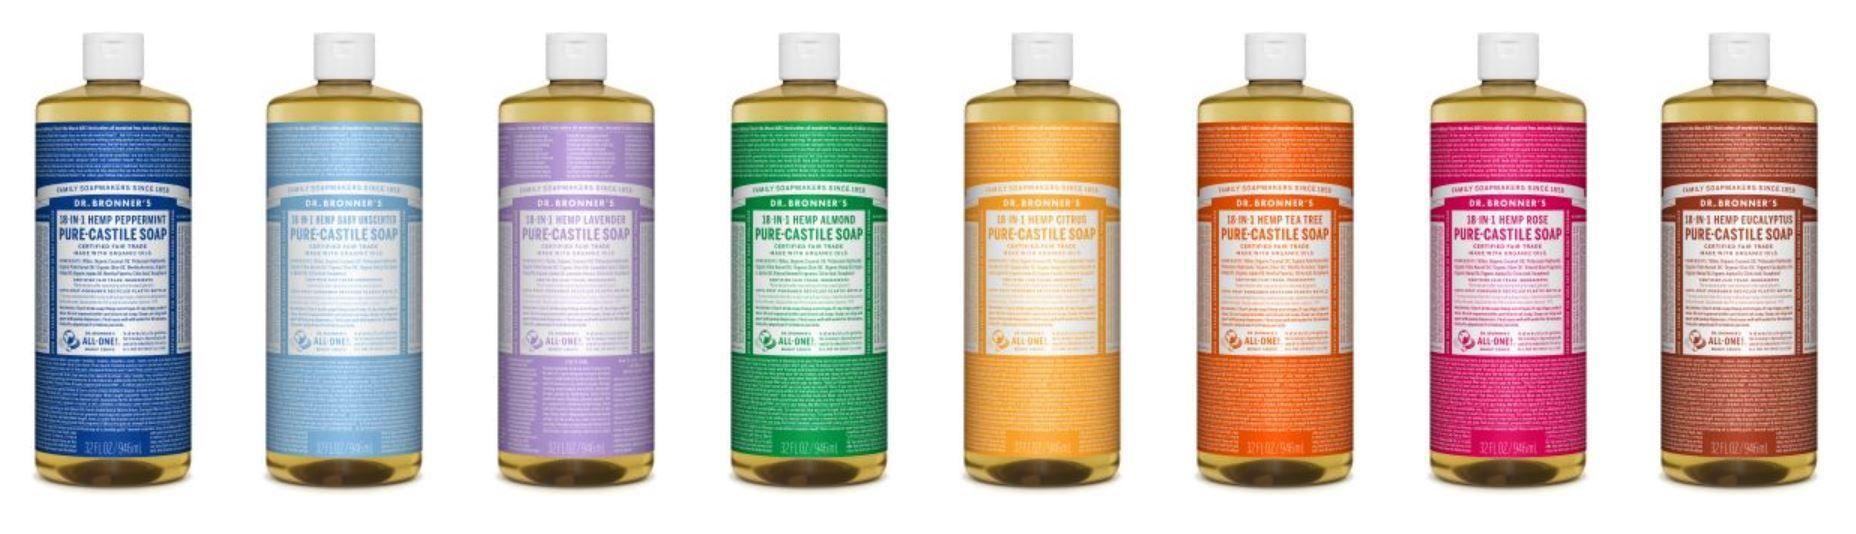 Dr  Bronner Pure-Castile Liquid Soap Review | Black Hair